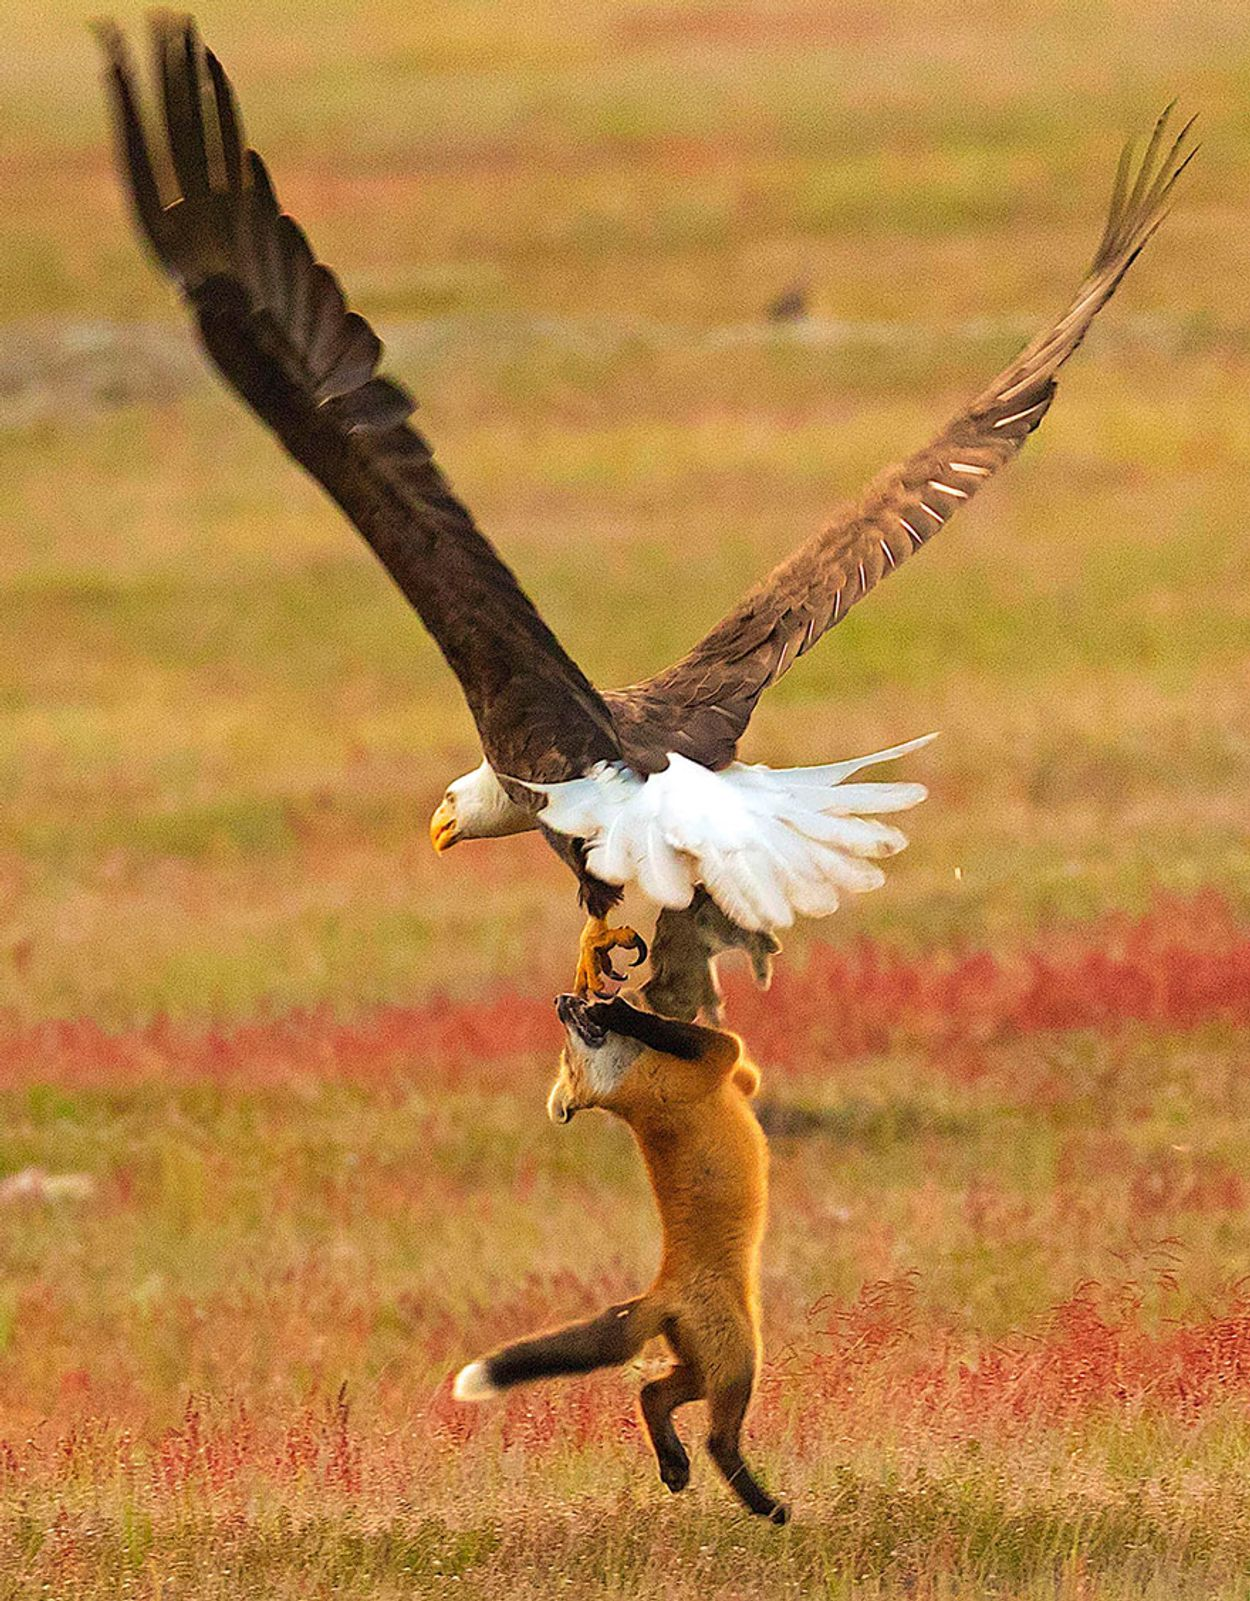 5b07de91df2e4-wildlife-photography-eagle-fox-fighting-over-rabbit-kevin-ebi-9-5b0661f5347b7__880